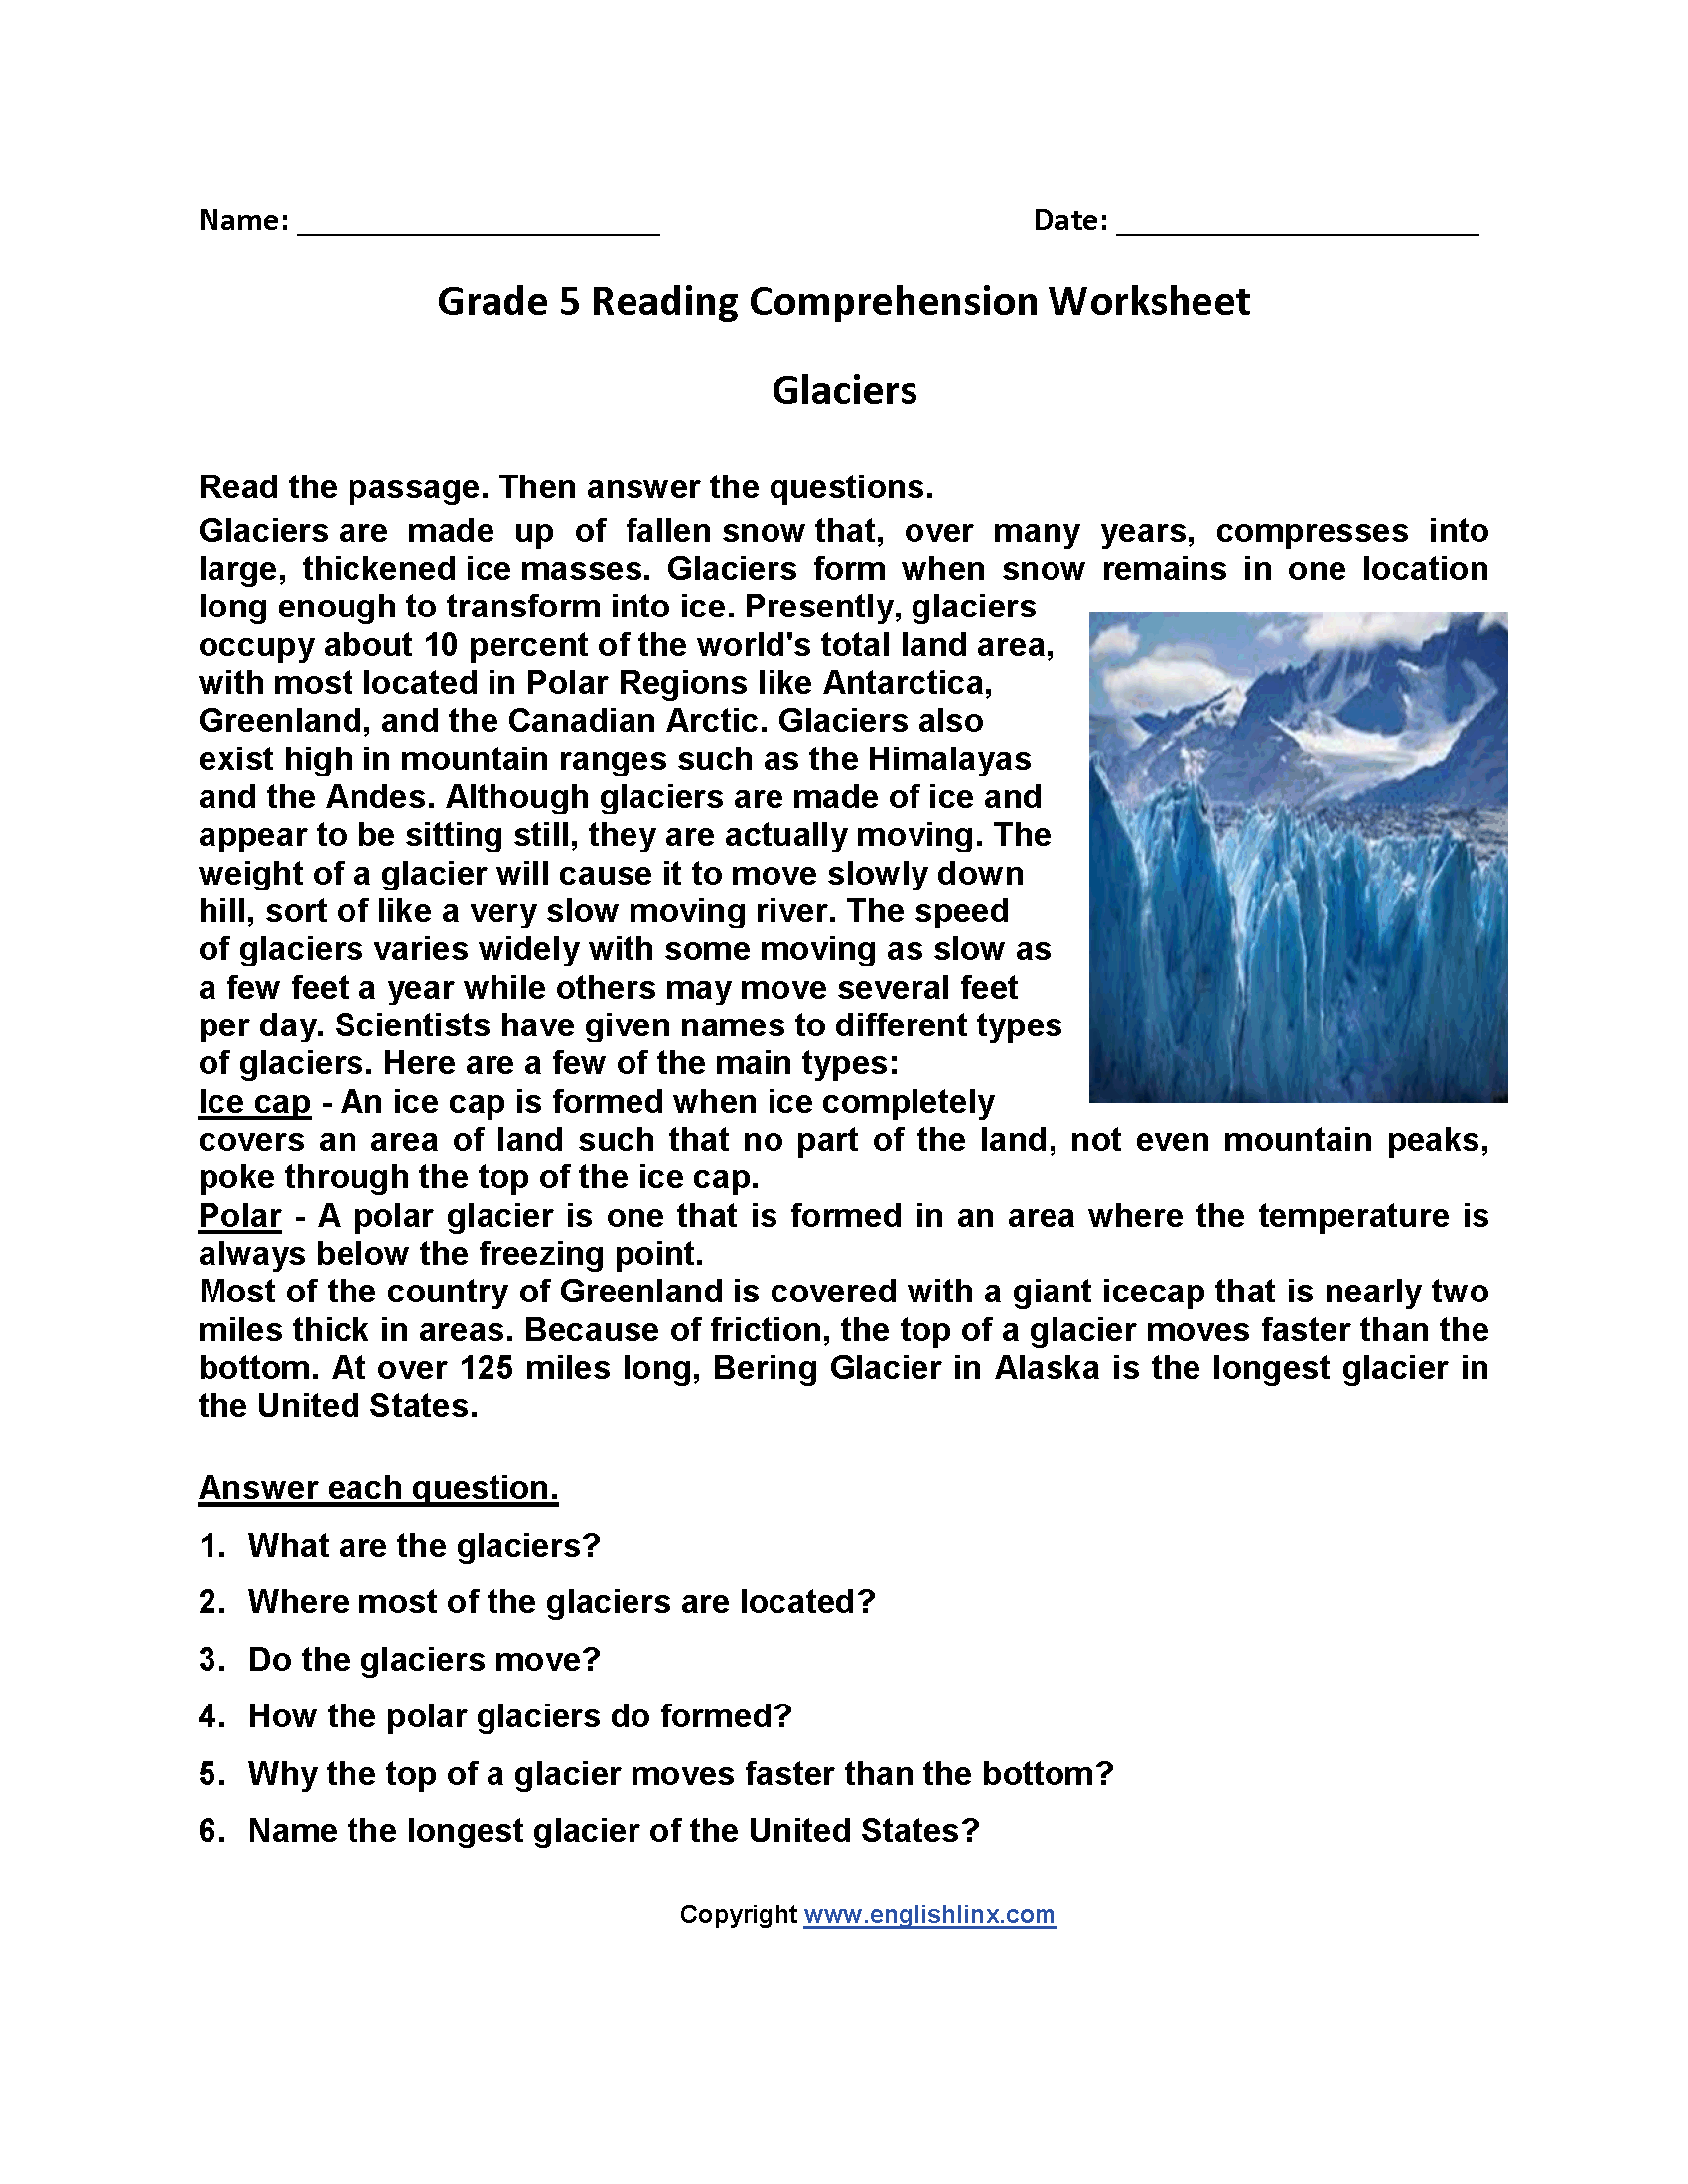 Glaciers Fifth Grade Reading Worksheets   Reading comprehension worksheets [ 2200 x 1700 Pixel ]